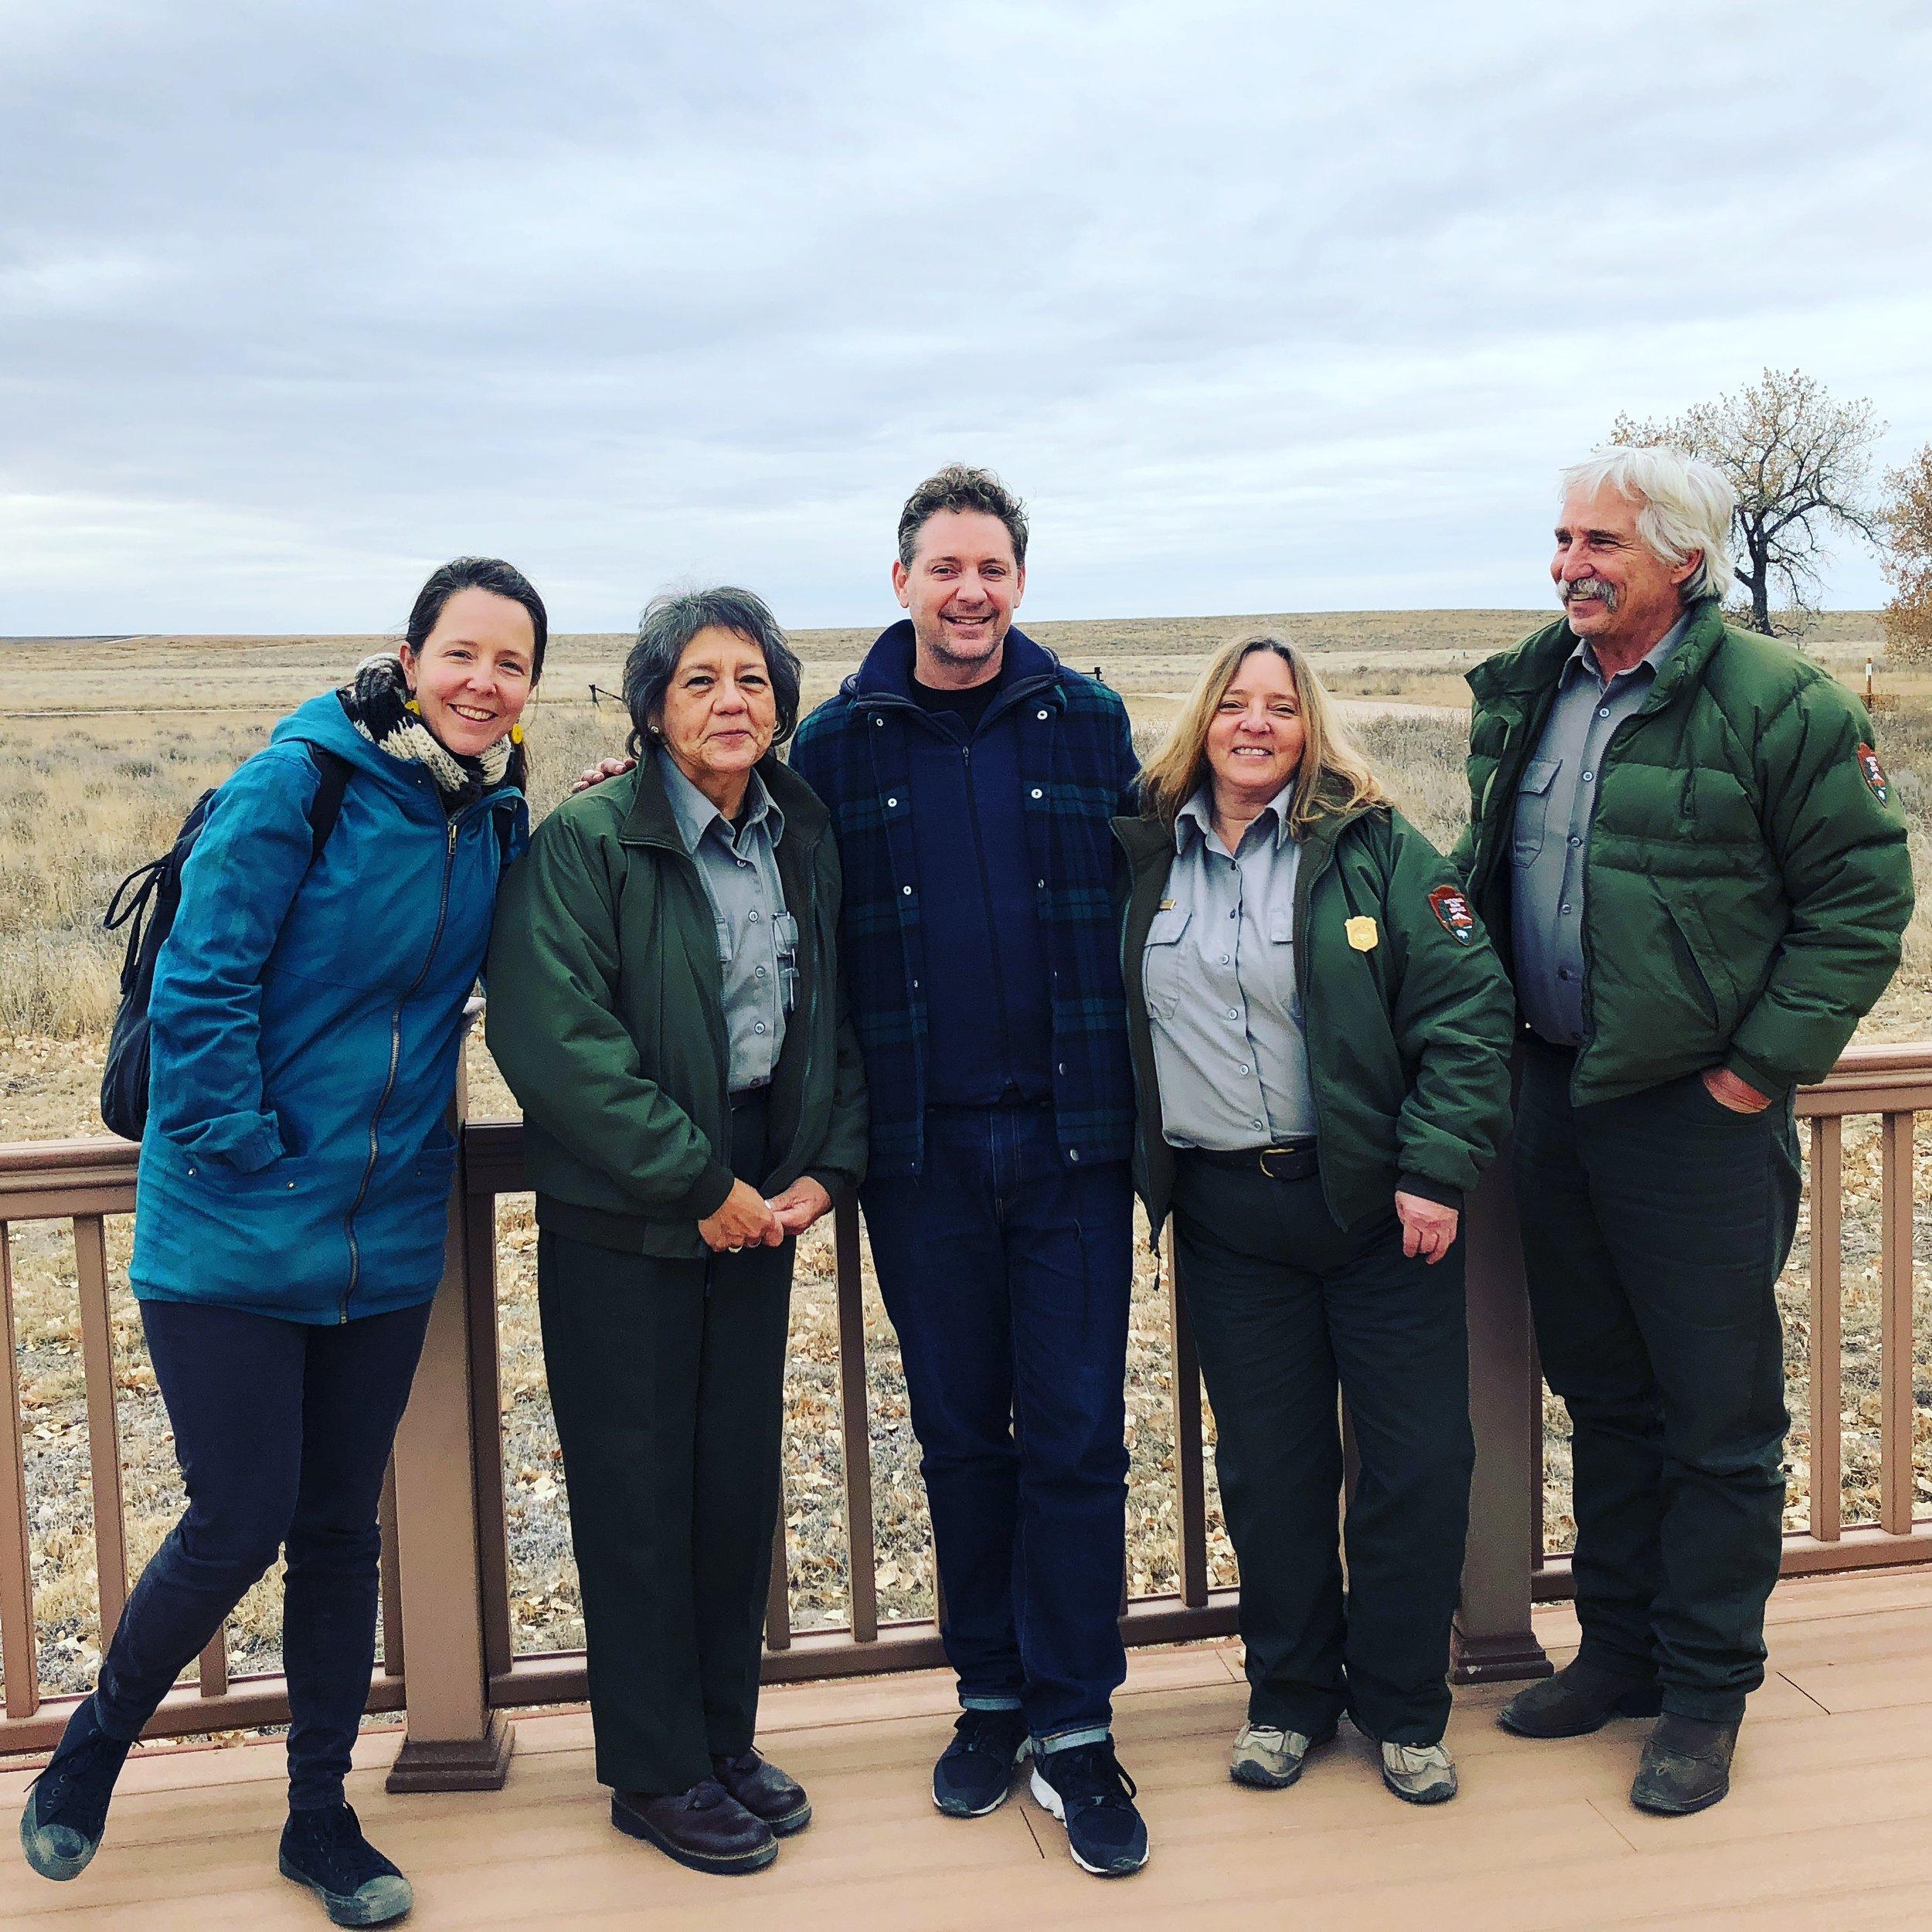 Jessica Neath and Brook Andrew with Karen Wilde, Tribal Liaison, Alexa Roberts, Superintendent, and Karl Zimmermann, Sand Creek Massacre National Historic Site, 30 October 2017.